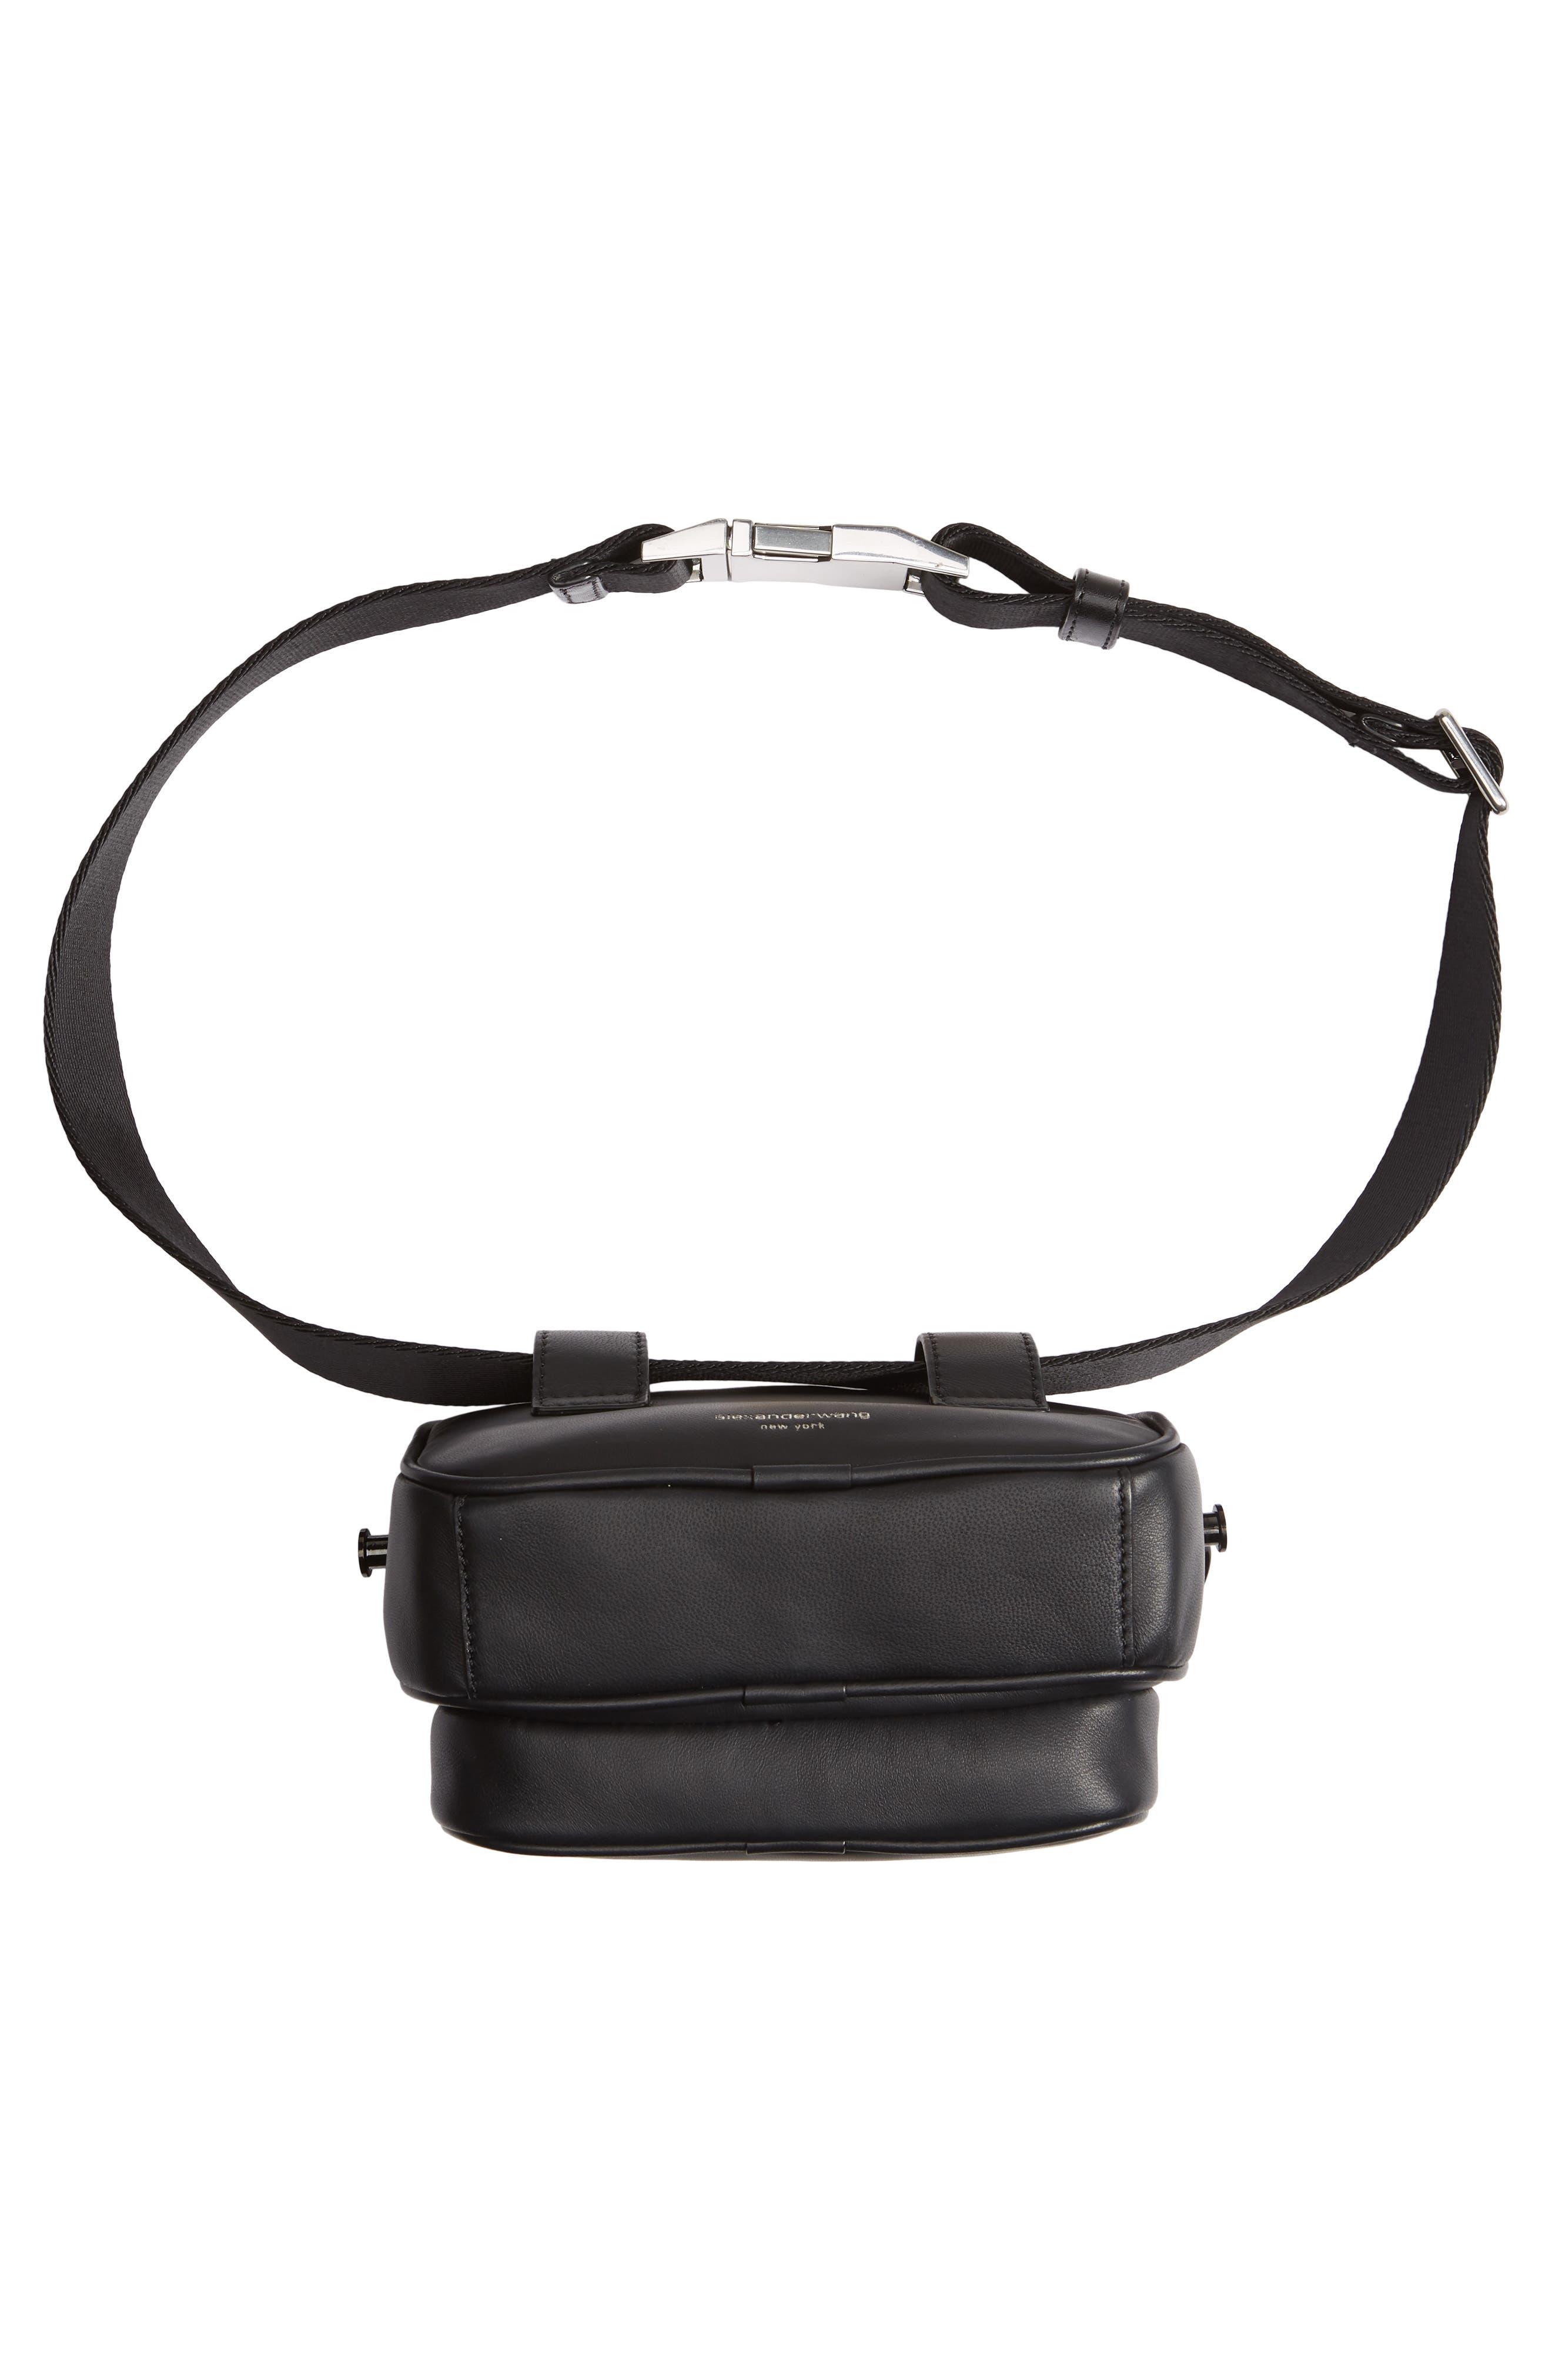 ALEXANDER WANG, Attica Logo Leather Belt Bag, Alternate thumbnail 8, color, BLACK